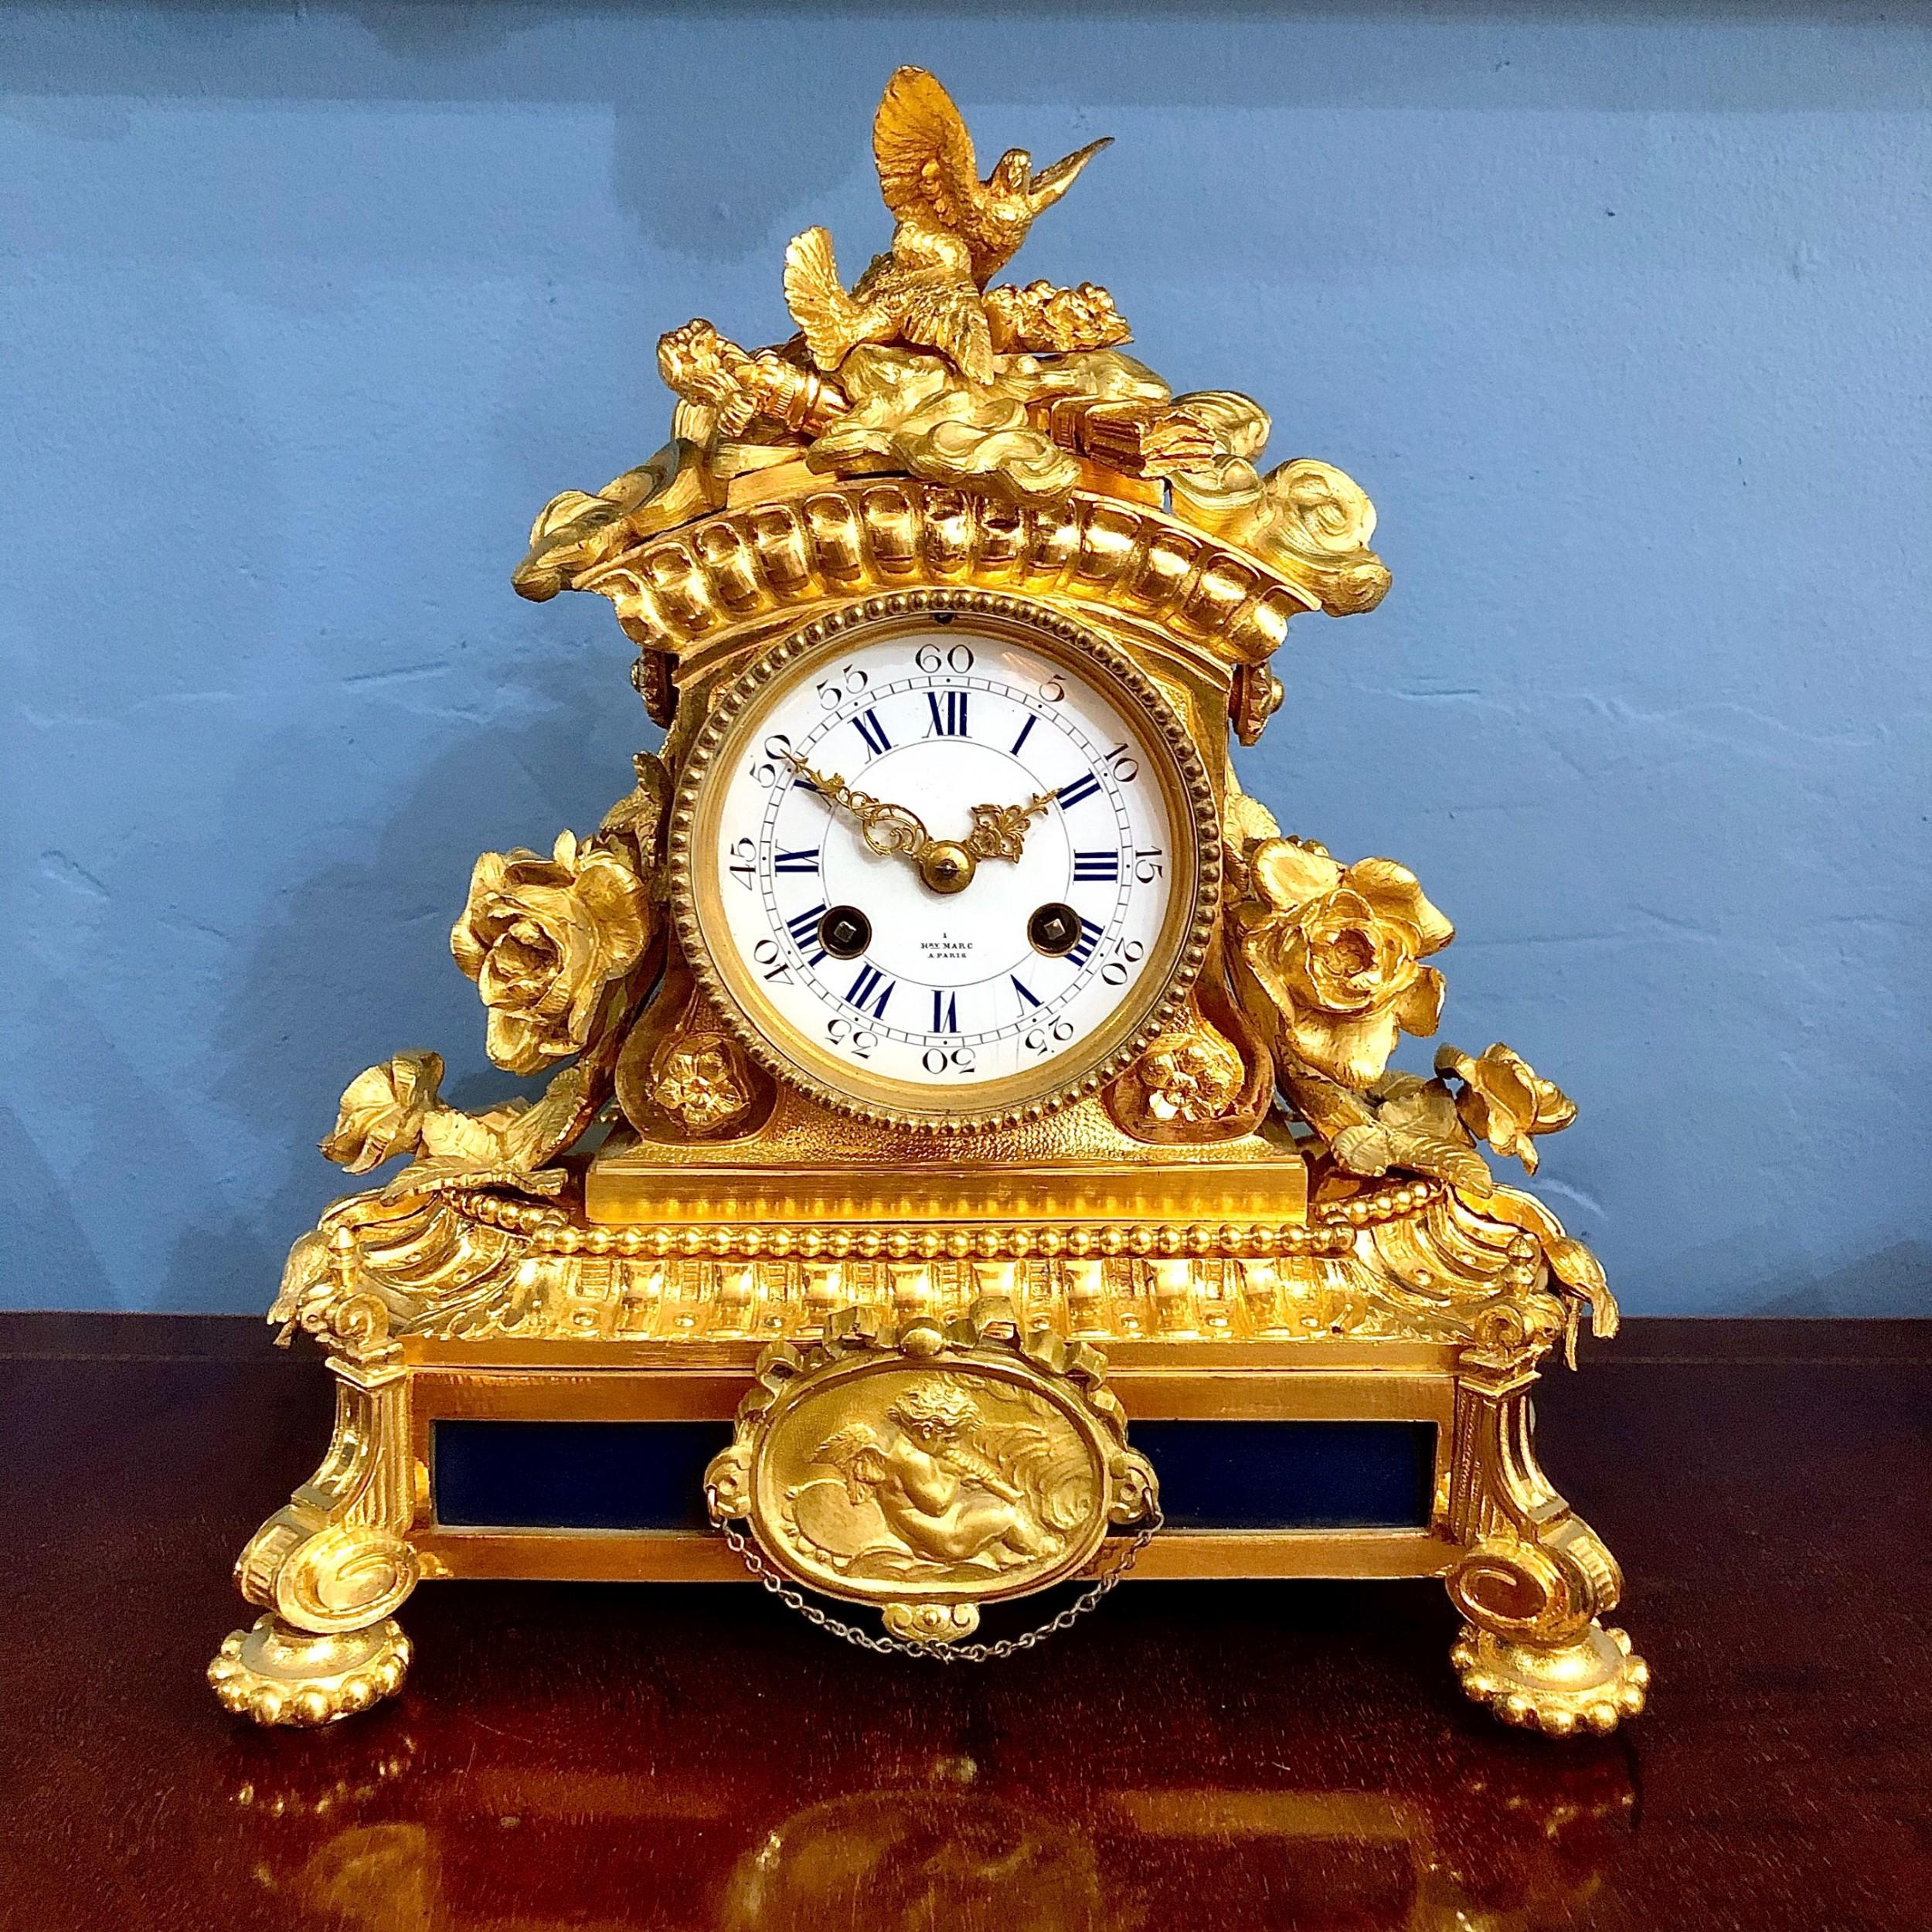 a fine mantel clock by henri marc